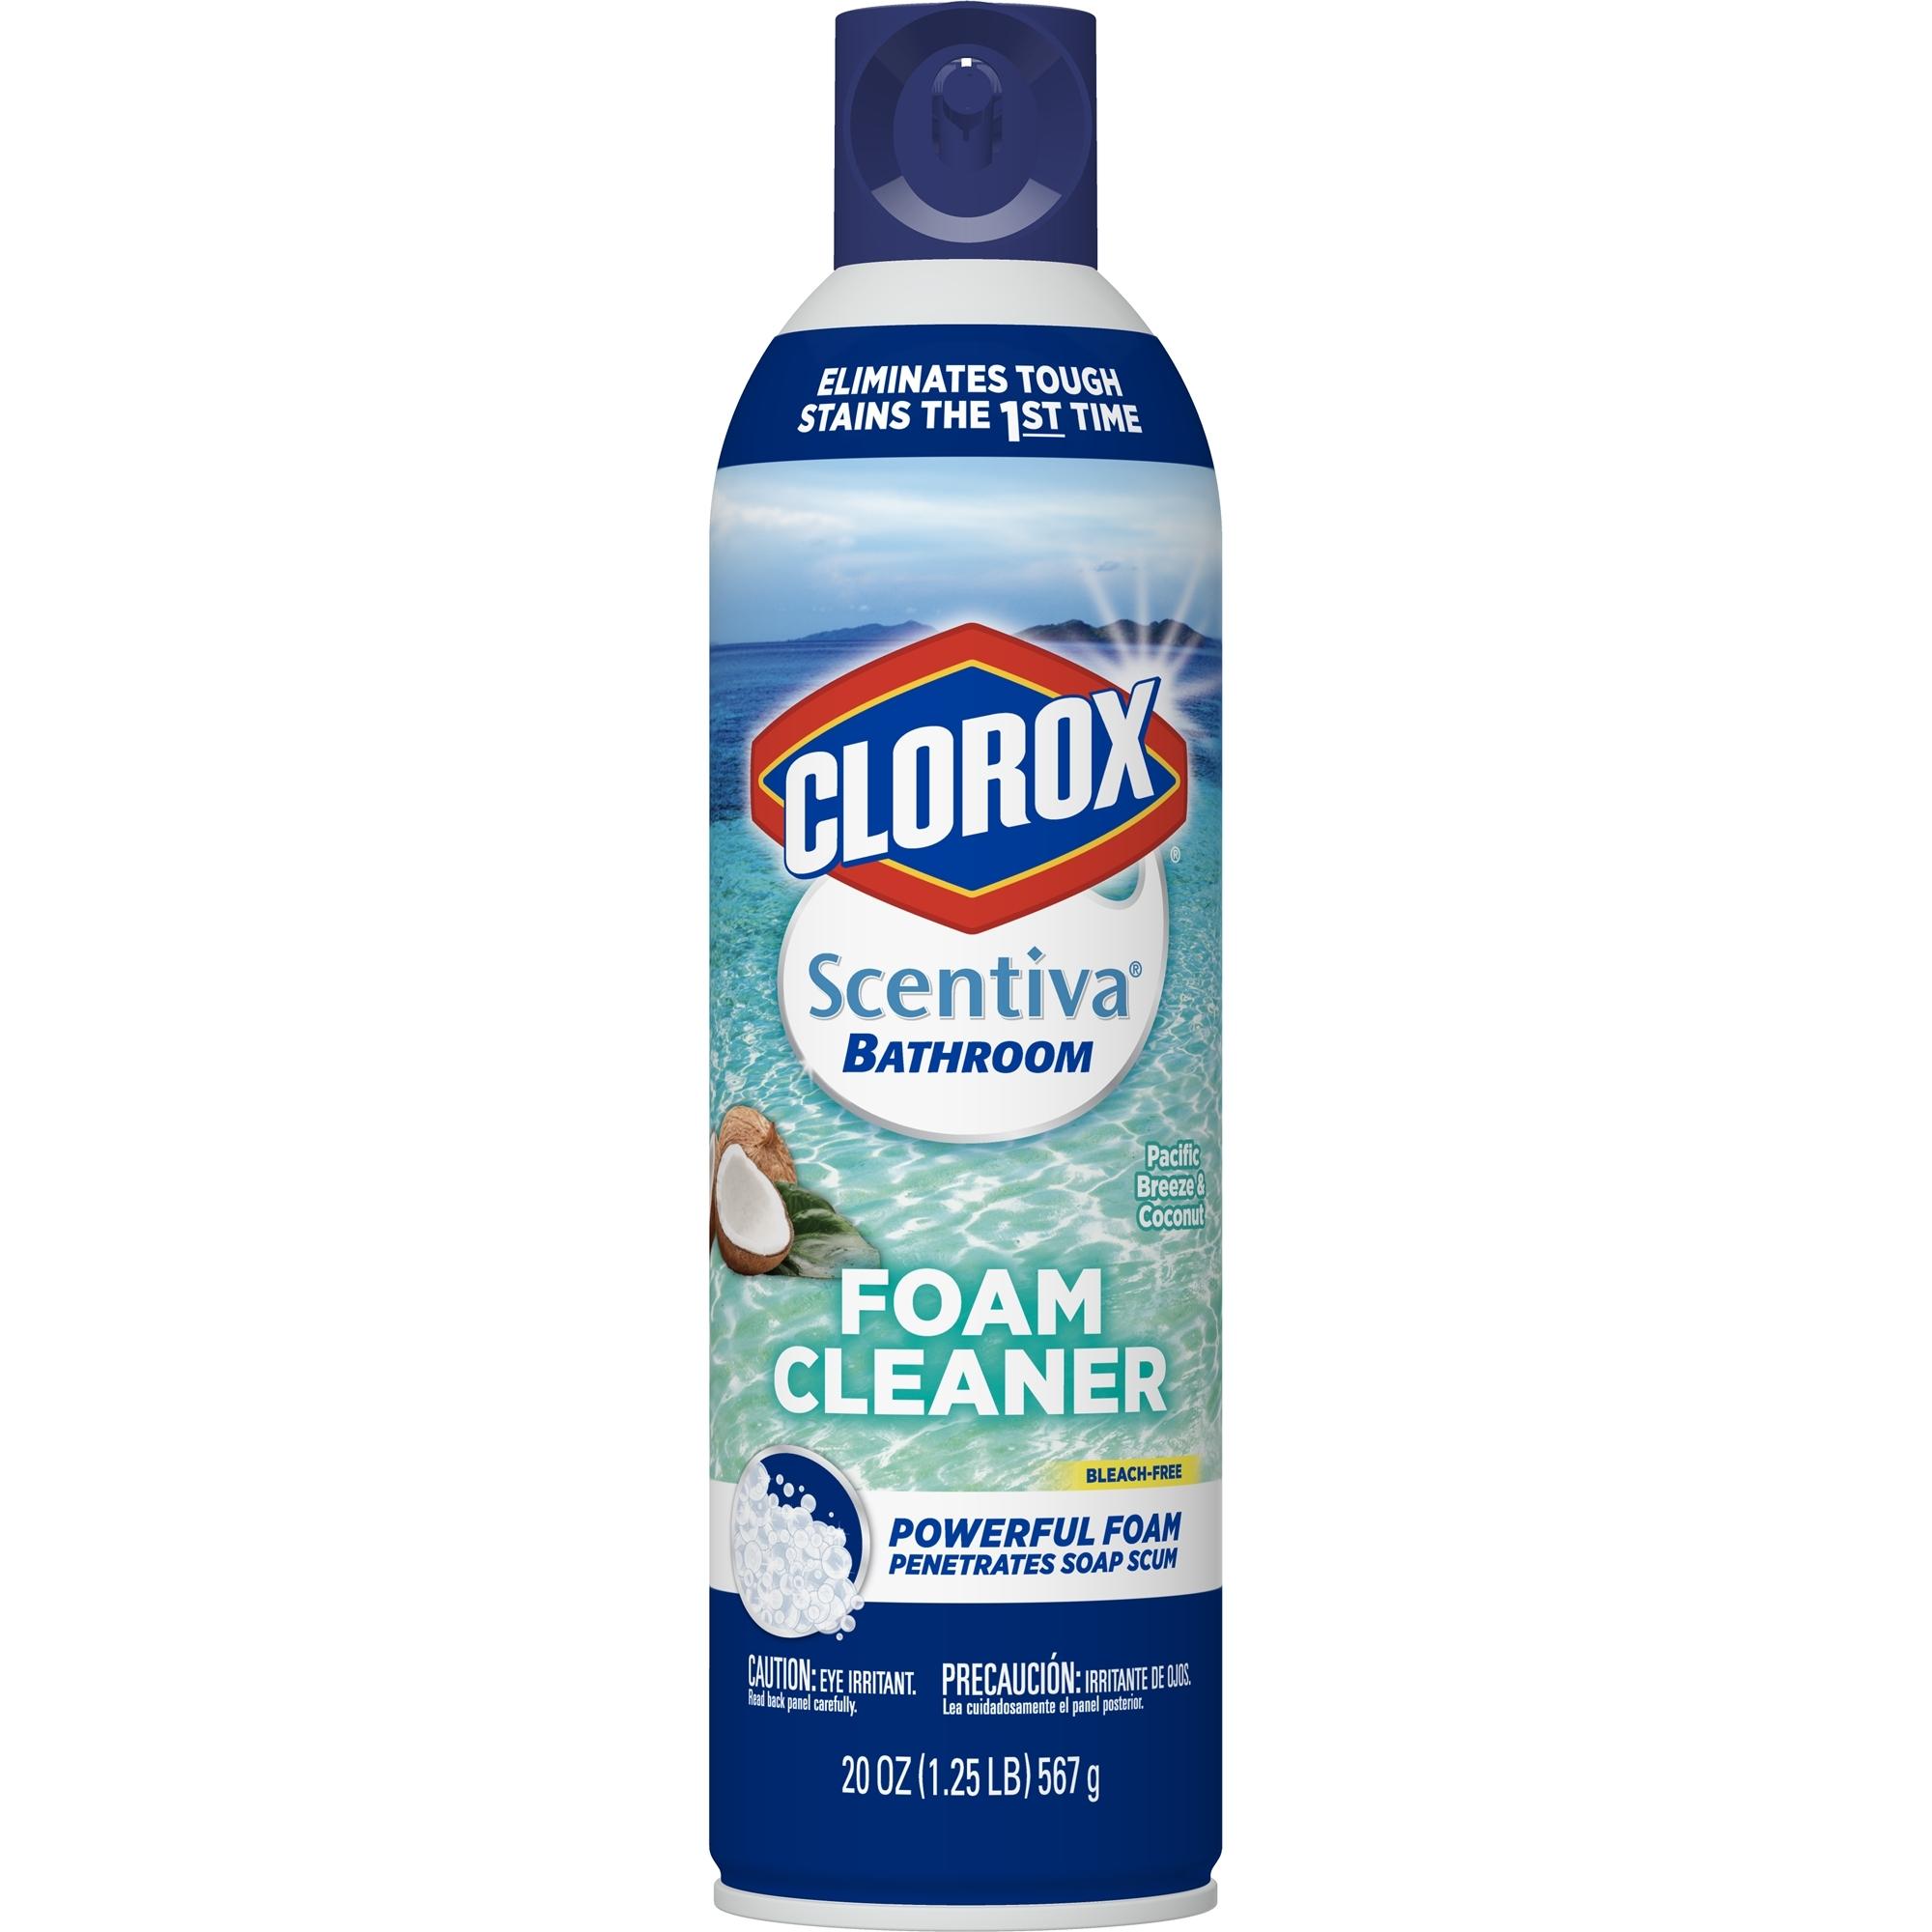 Clorox scentiva bathroom foam cleaner lavender pacific - Clorox bathroom foamer with bleach ...